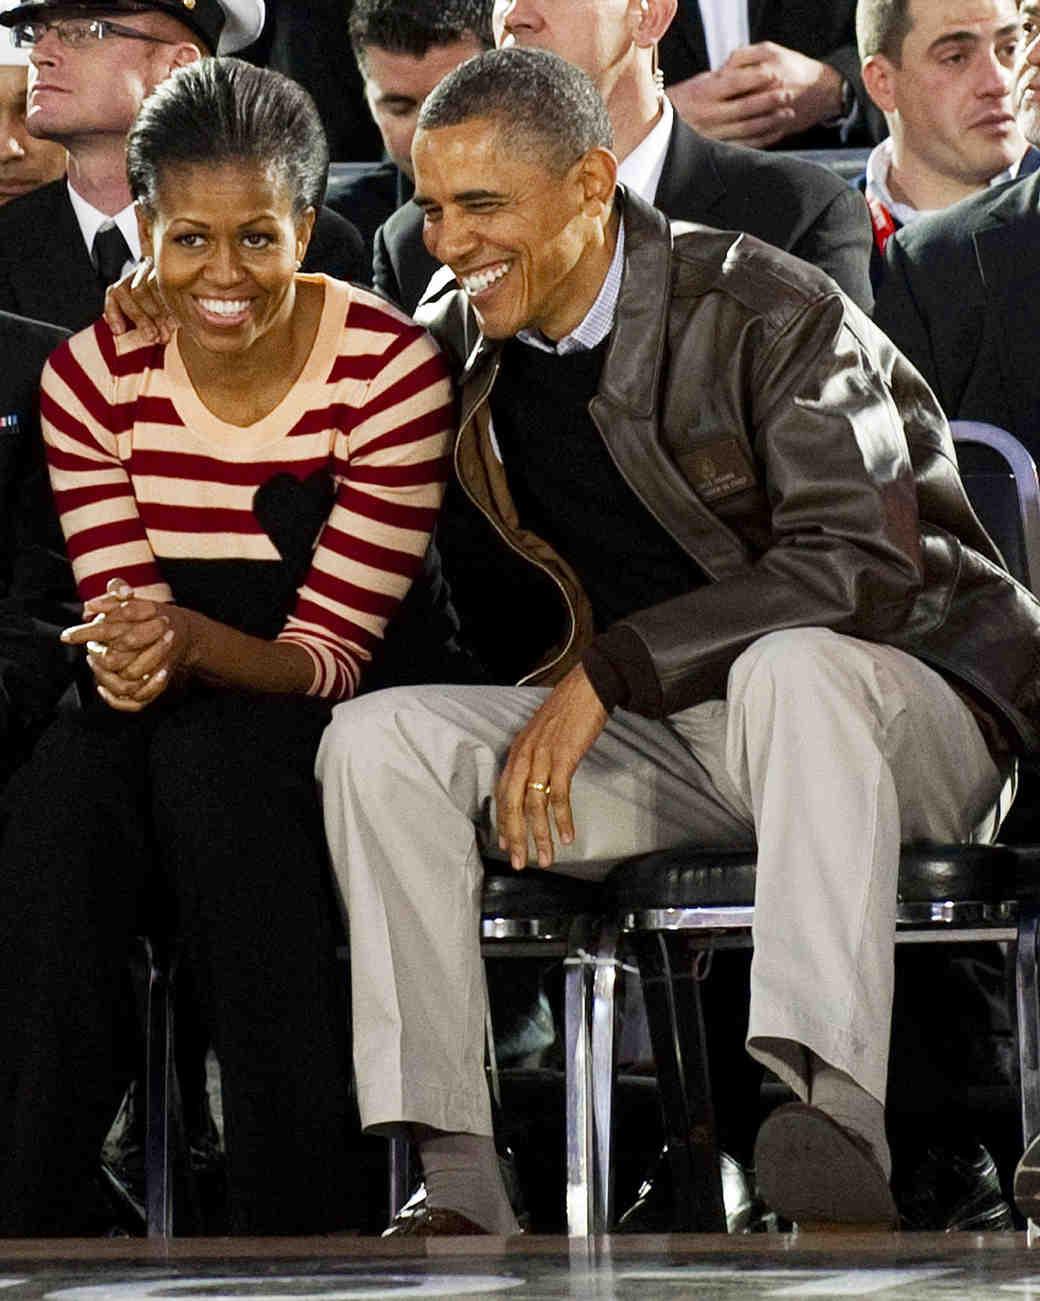 celebs-courtside-barack-obama-michelle-obama-0616.jpg